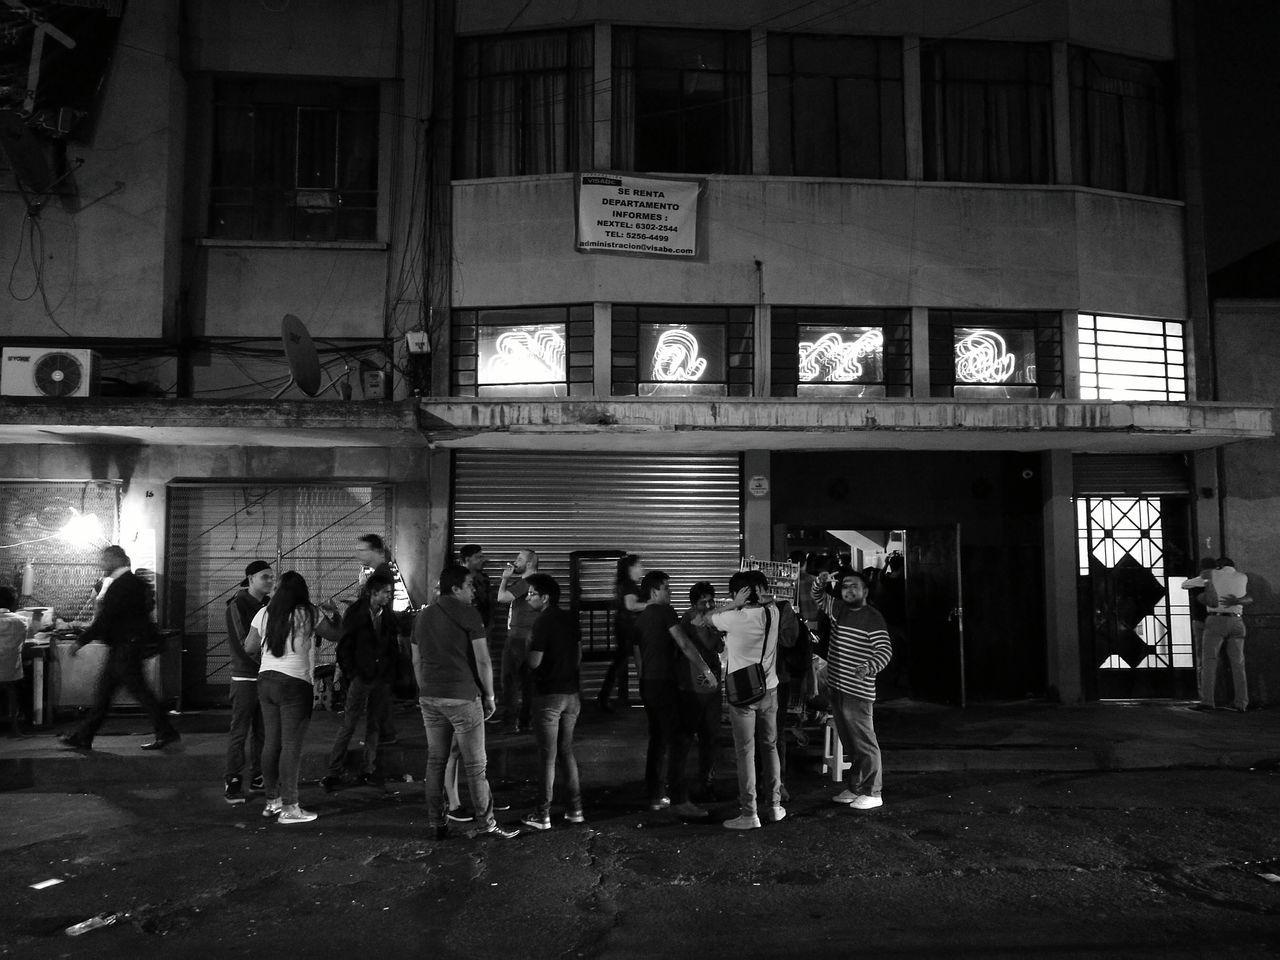 Night Large Group Of People Huawei P9 Leica HuaweiP9 Blancoynegro Blackandwhite Noche Closed Door Illuminated Cerrado Mexico City City Mexico Centrohistorico Centrohistoricodf Elmarra Marrakech Disco People HuaweiP9